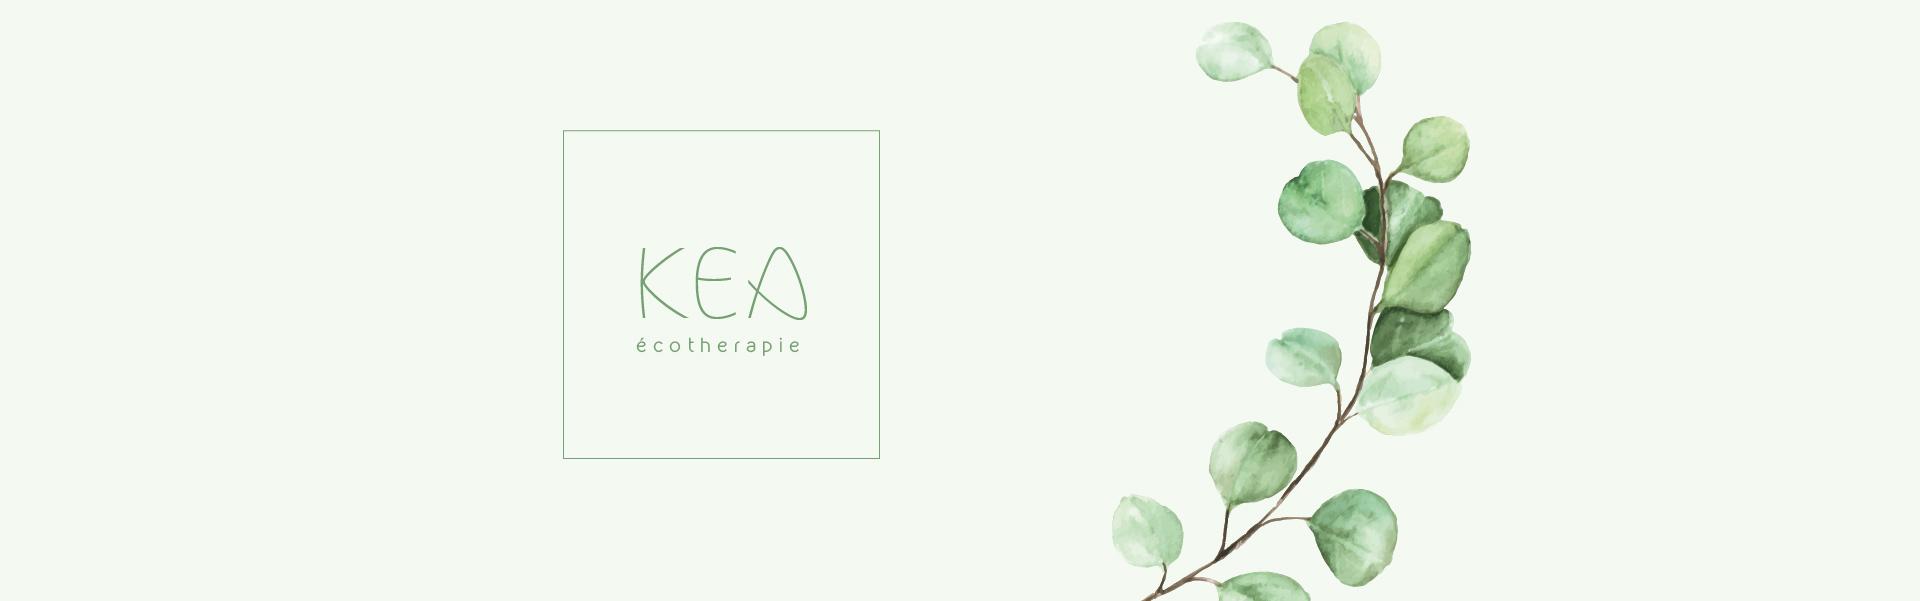 kea-ecothérapie